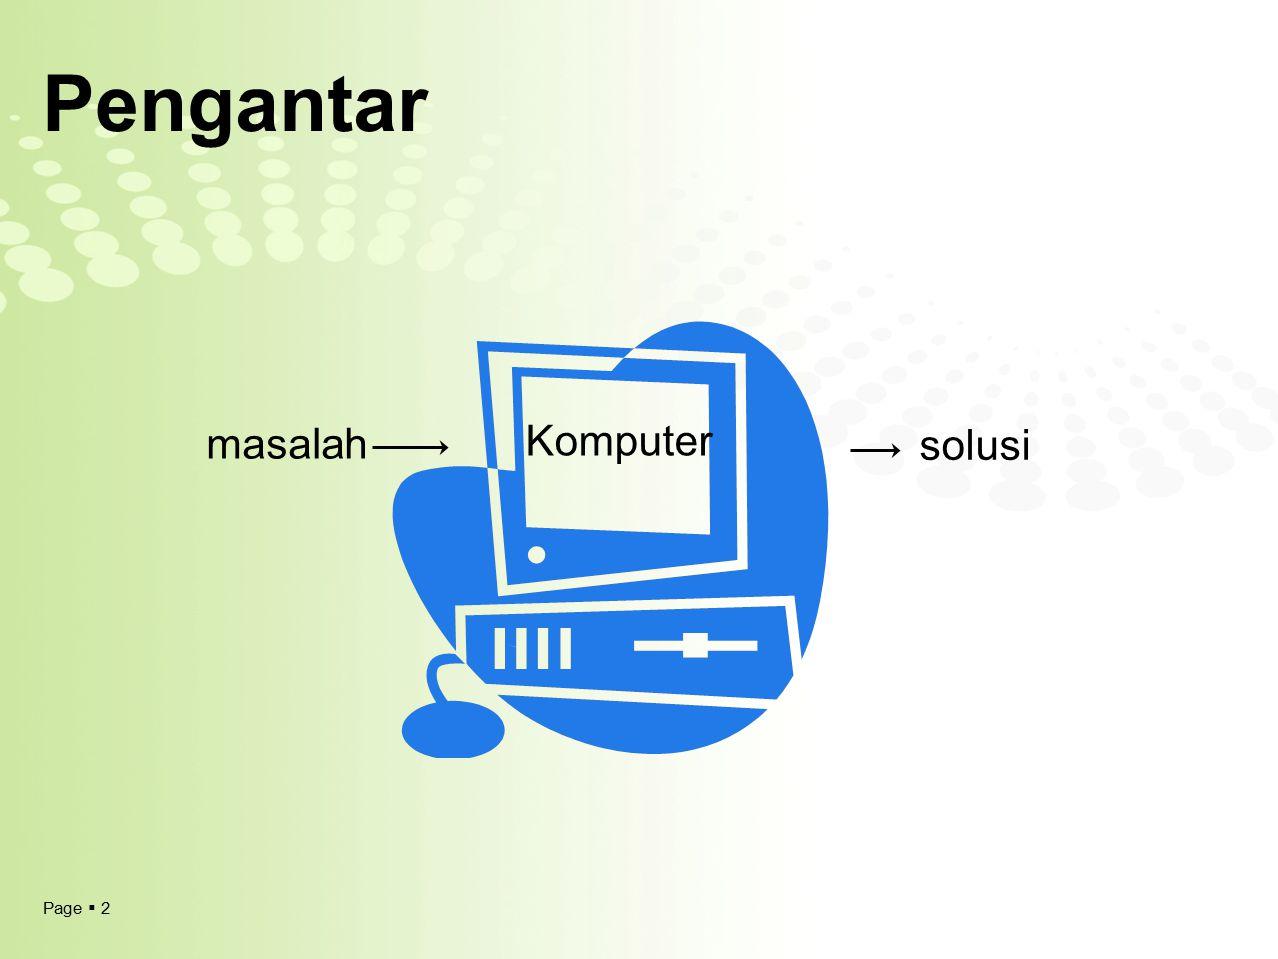 Page  3 Program, Bahasa Pemrograman dan pemrograman  Program adalah kata, ekspresi, pernyataan yang disusun dan dirangkai menjadi satu kesatuan prosedur yang berupa urutan langkah untuk menyelesaikan masalah yang diimplementasikan dengan menggunakan bahasa pemrograman sehingga dapat dieksekusi oleh komputer.